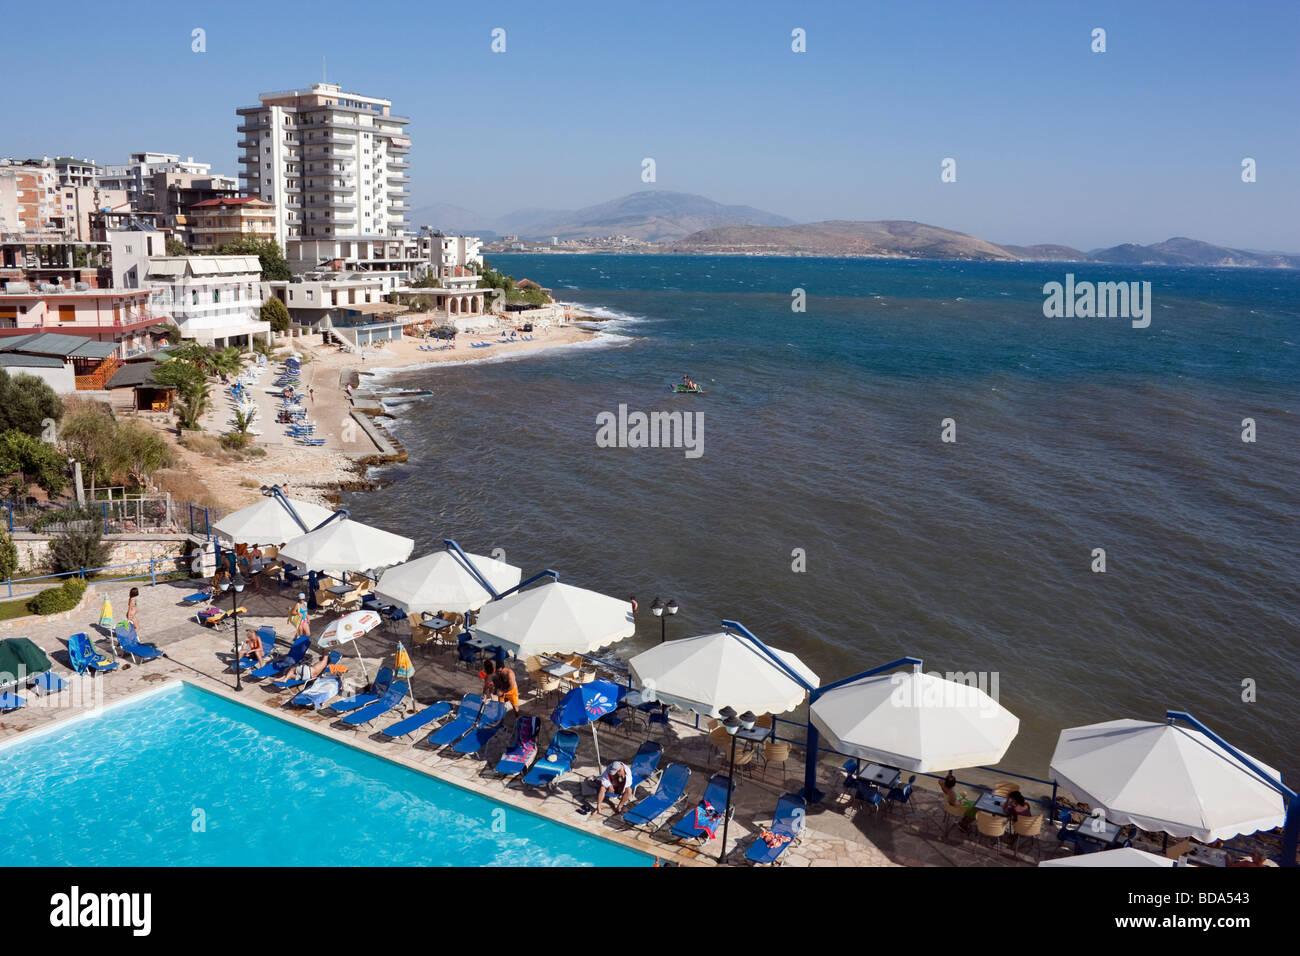 The view across to Corfu from the hotel Andon Lapa i Pare, Saranda, Albania. - Stock Image